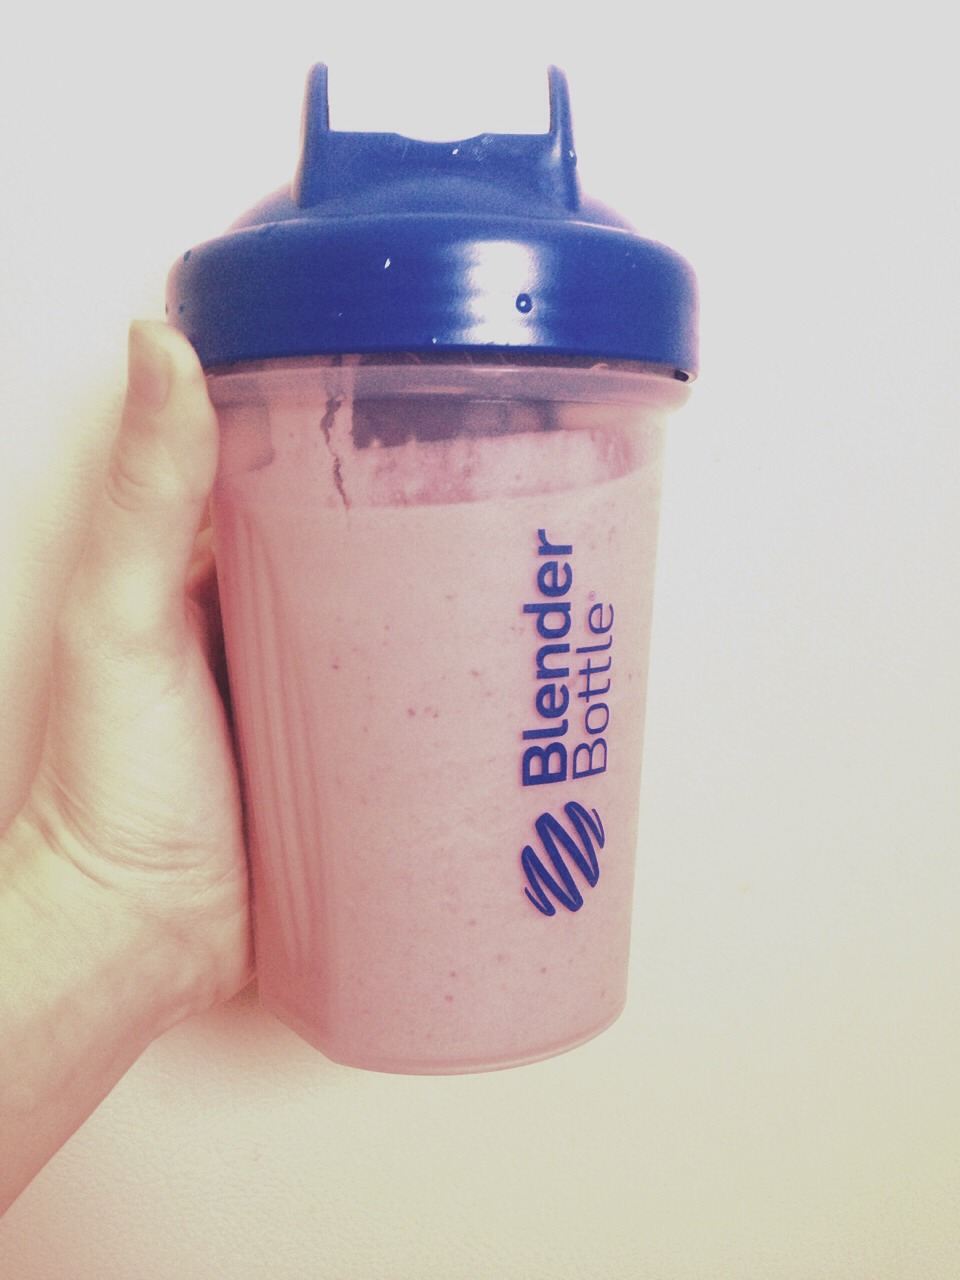 Tastes like a chocolate covered strawberry! :)